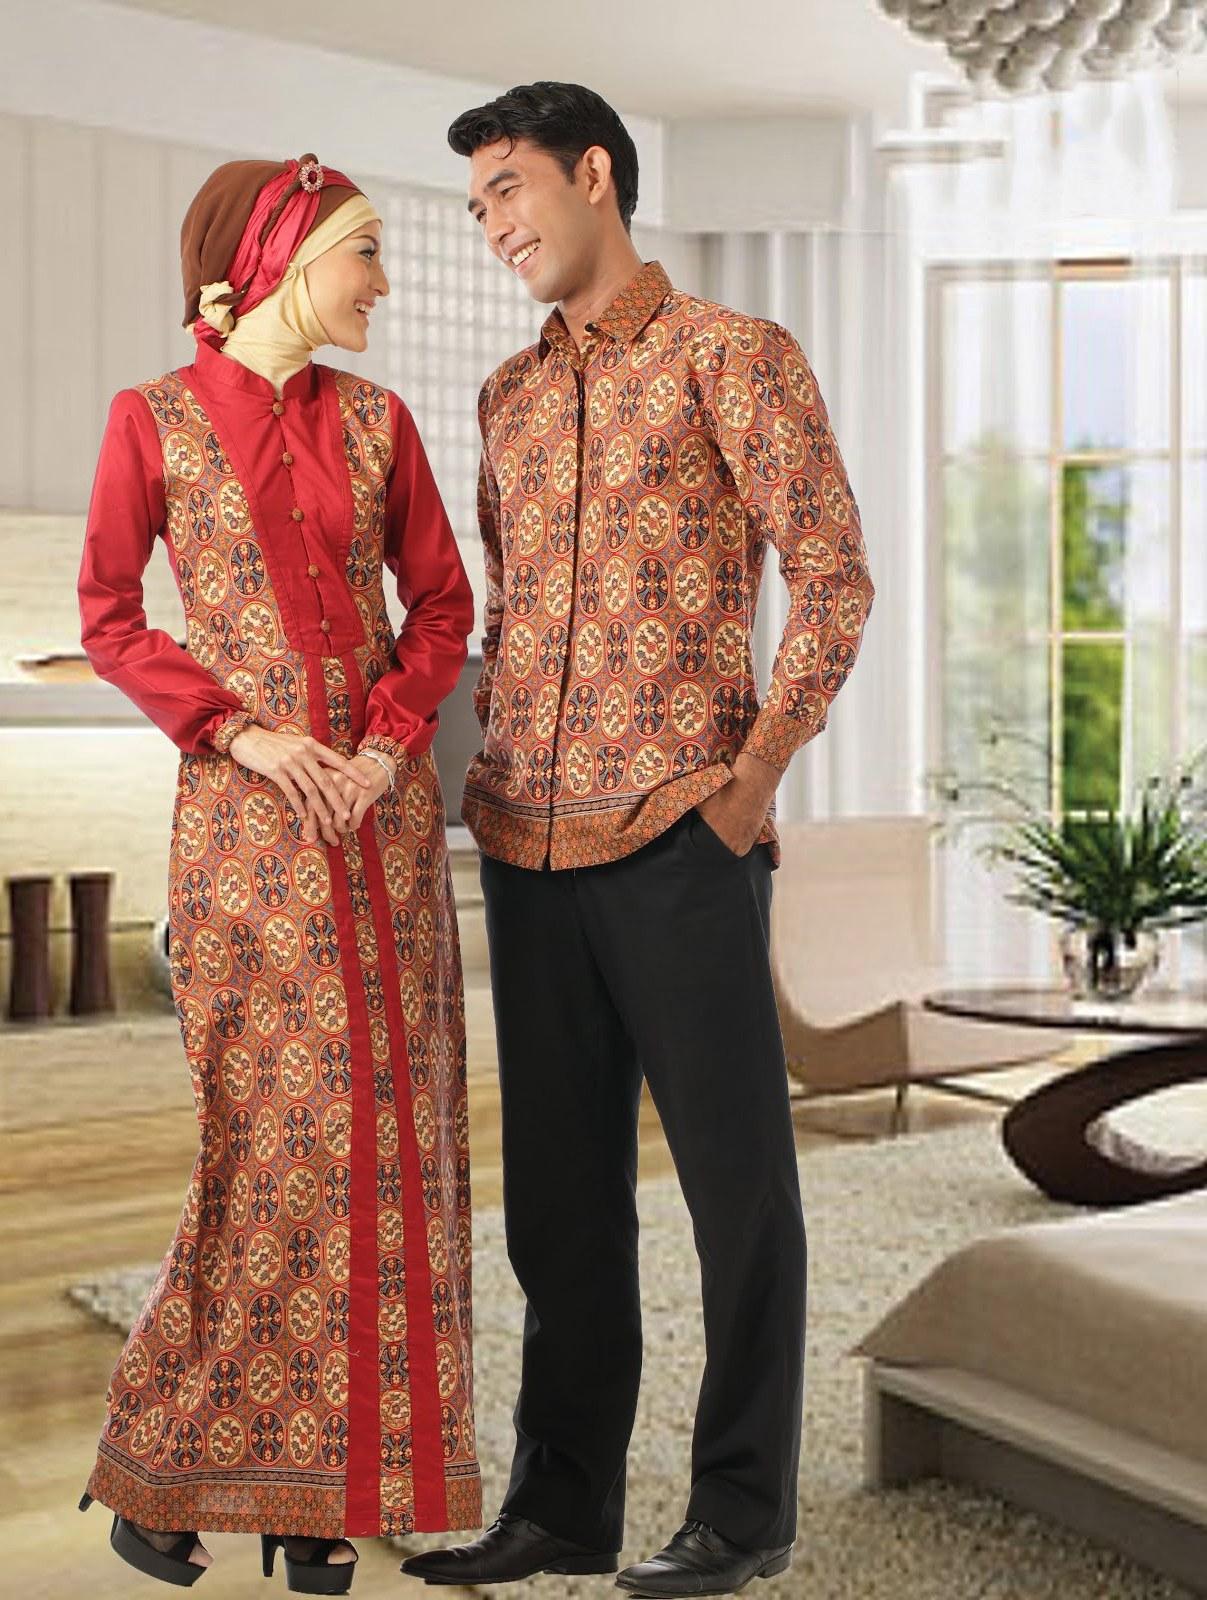 Ide Baju Lebaran Pria Terbaru Tqd3 Trend Model Baju Batik Lebaran Terbaru 2013